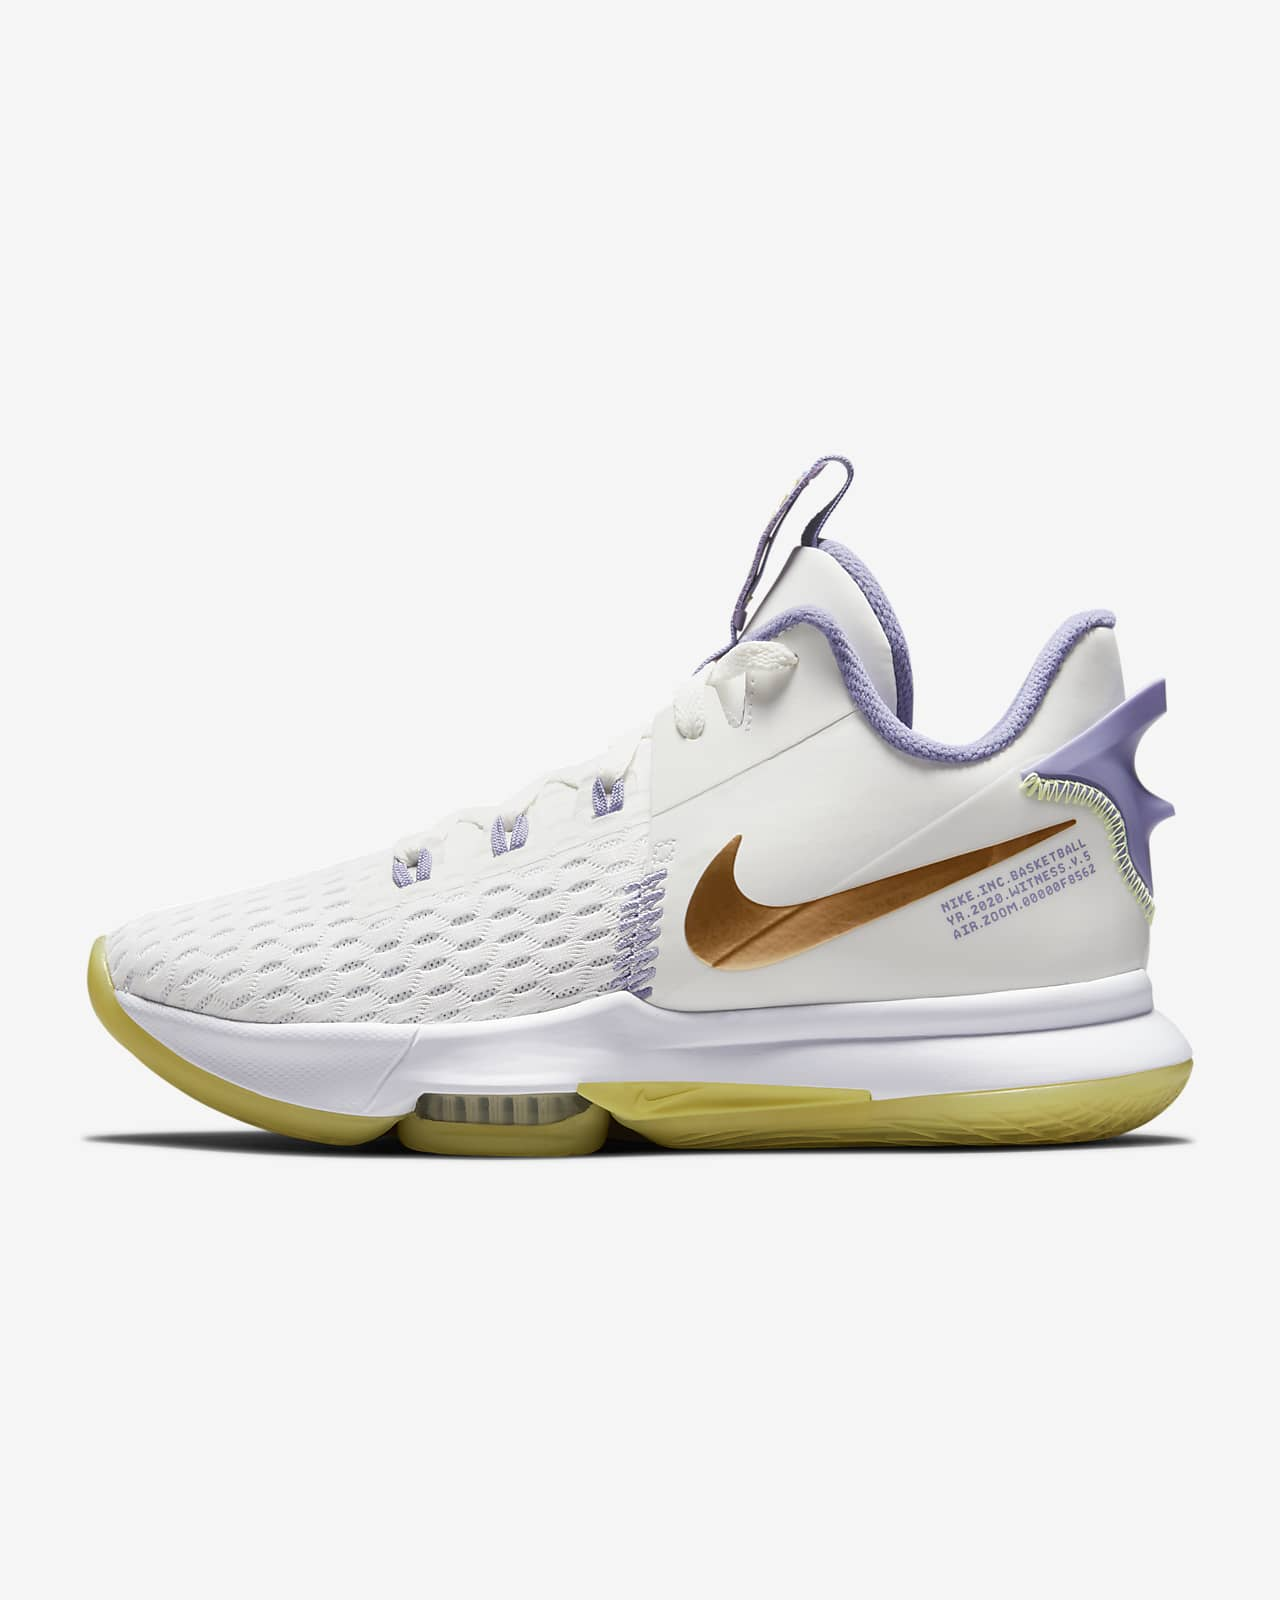 Sapatilhas de basquetebol LeBron Witness 5